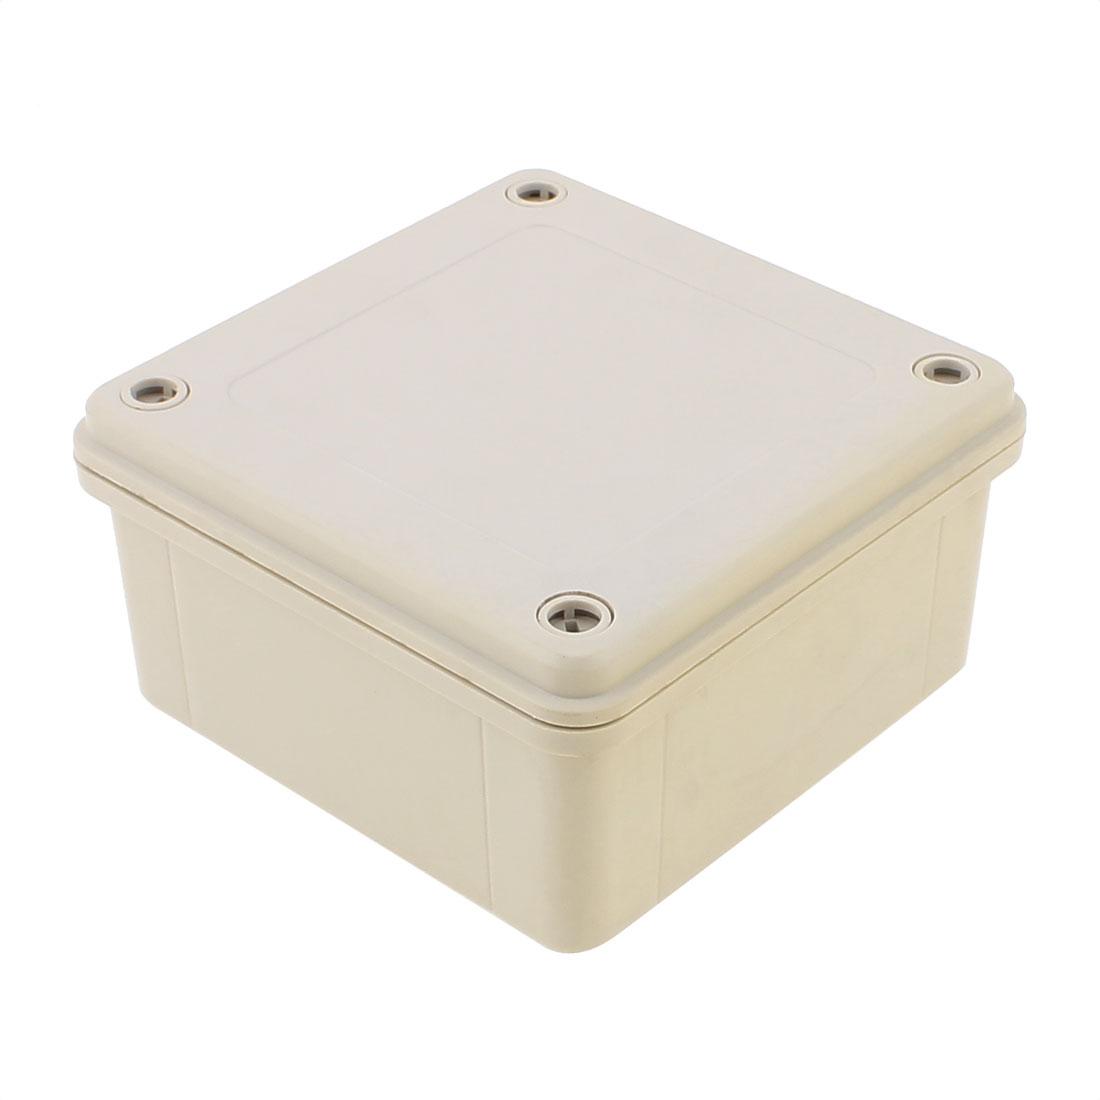 120 x 120 x 60mm Dustproof IP65 Junction Box DIY Terminal Connecting Box Enclosure